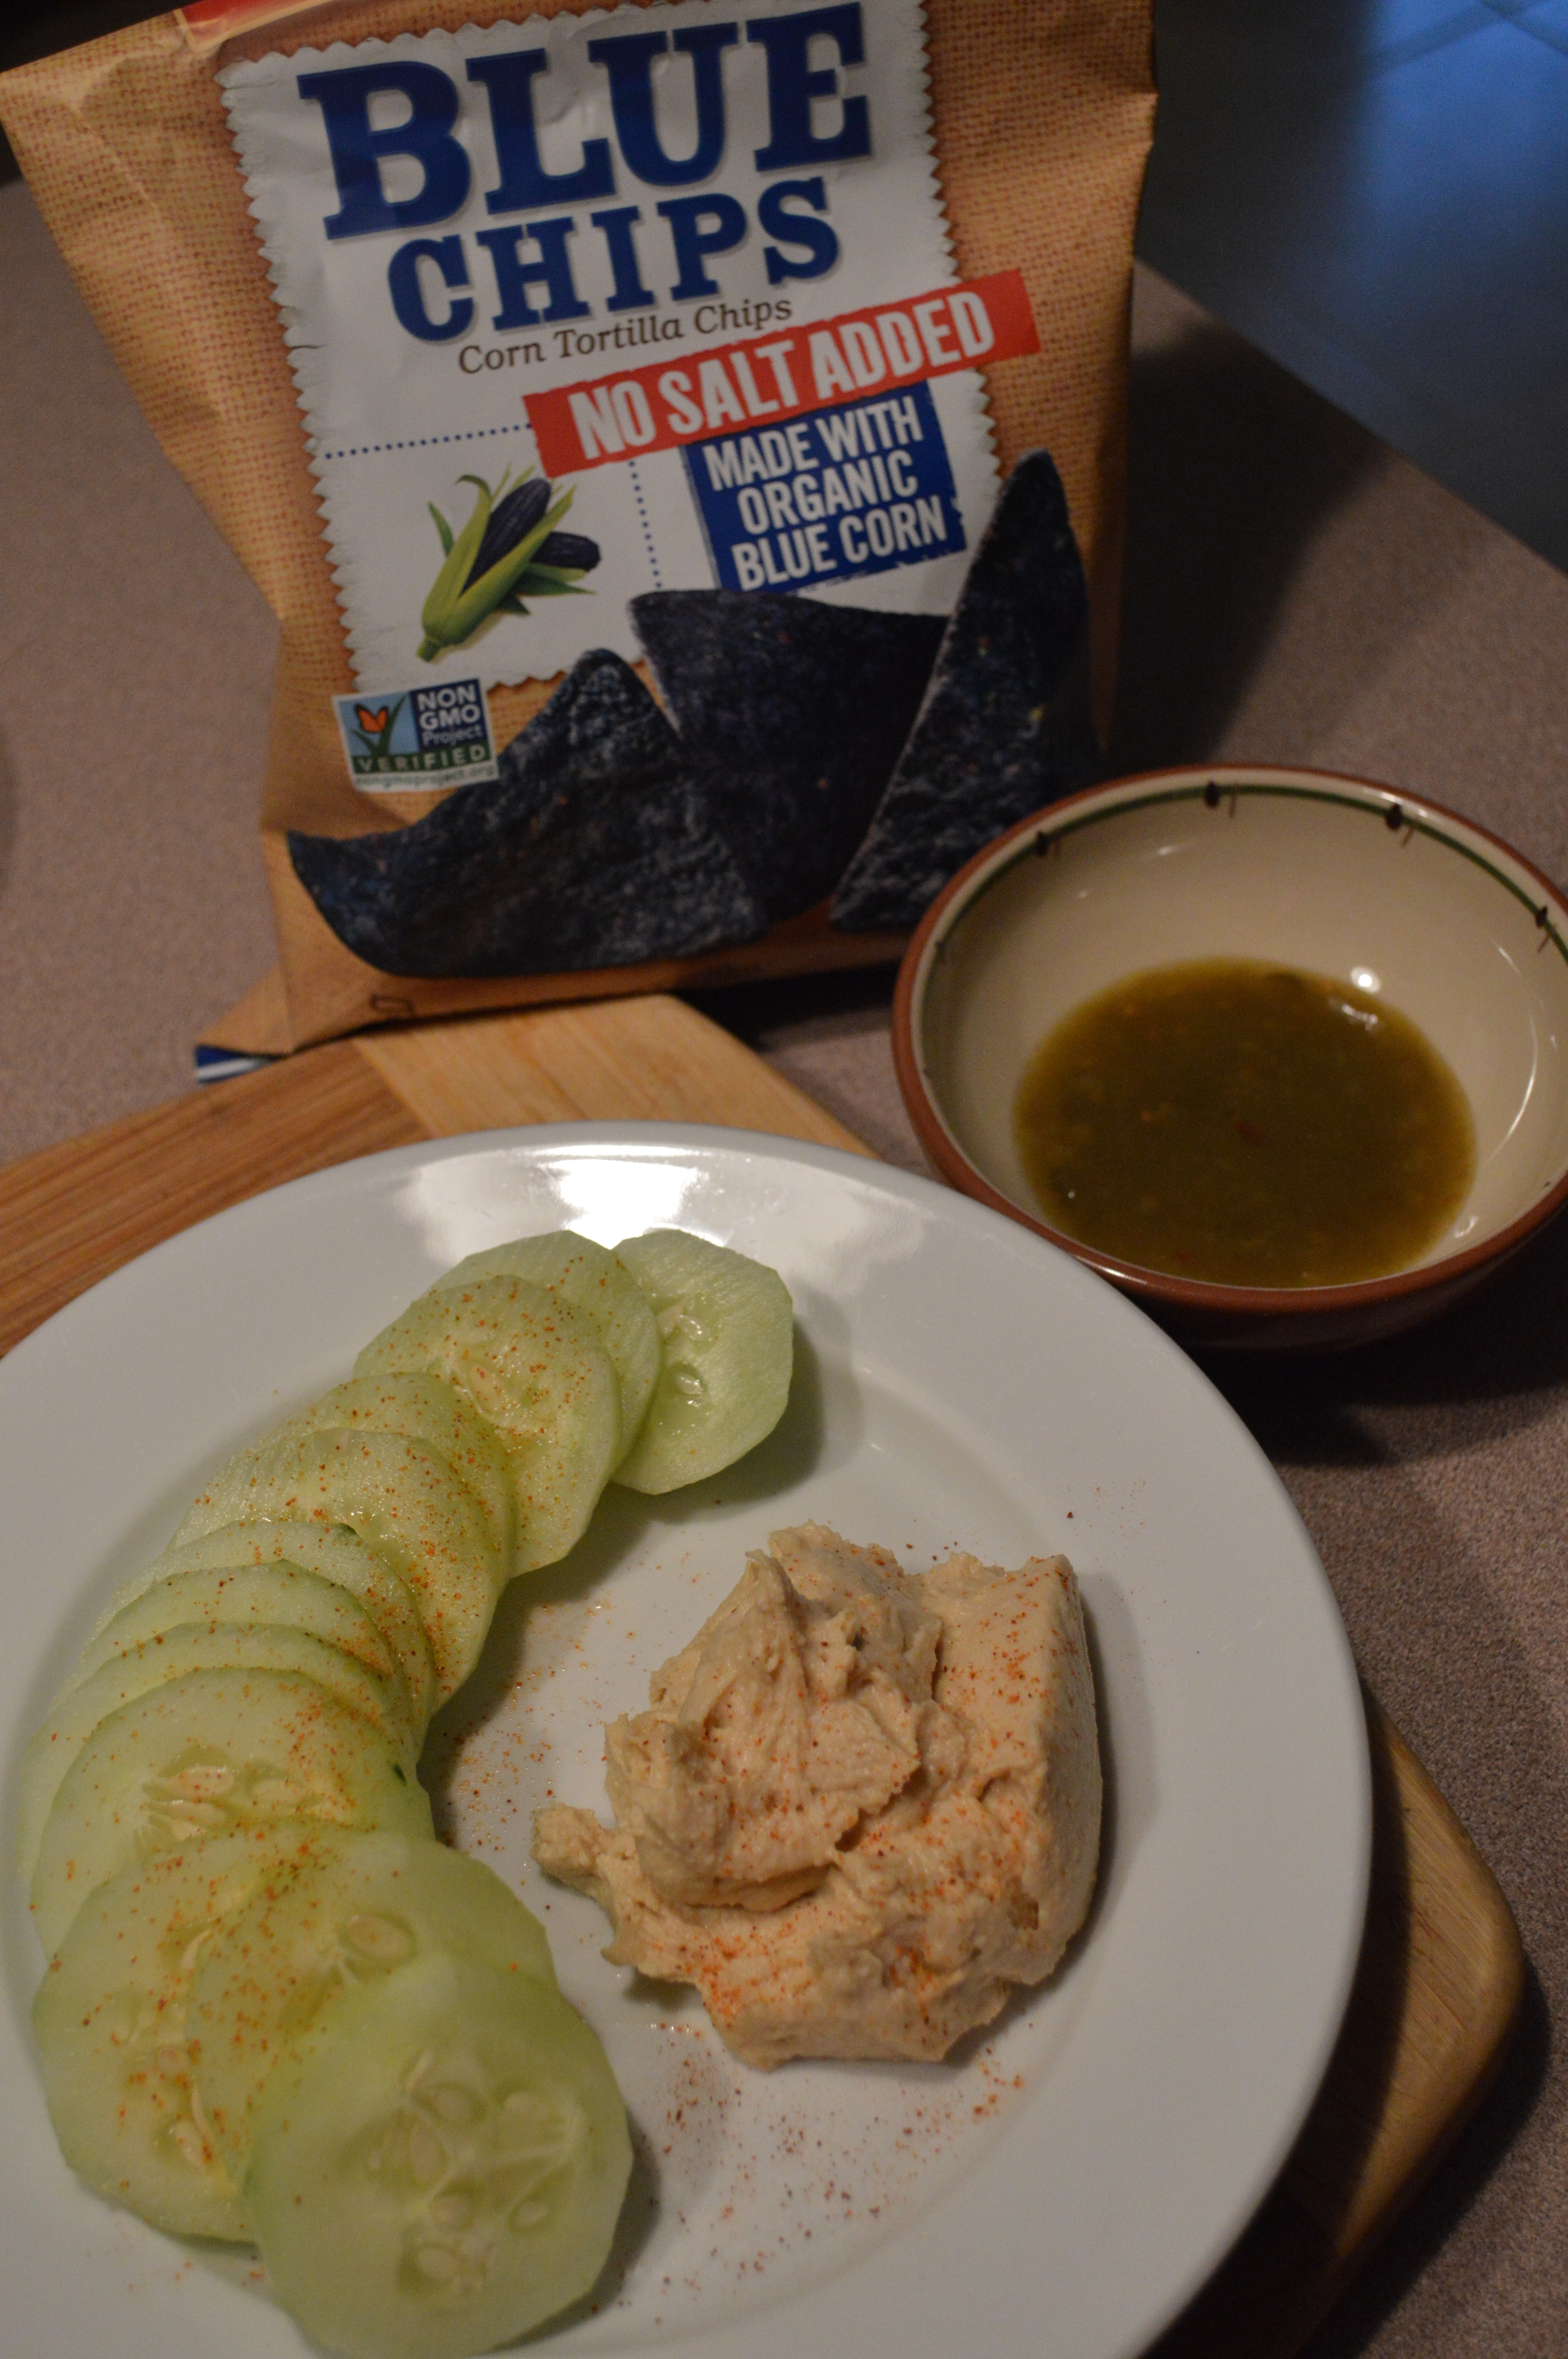 Cucumbers & Hummus